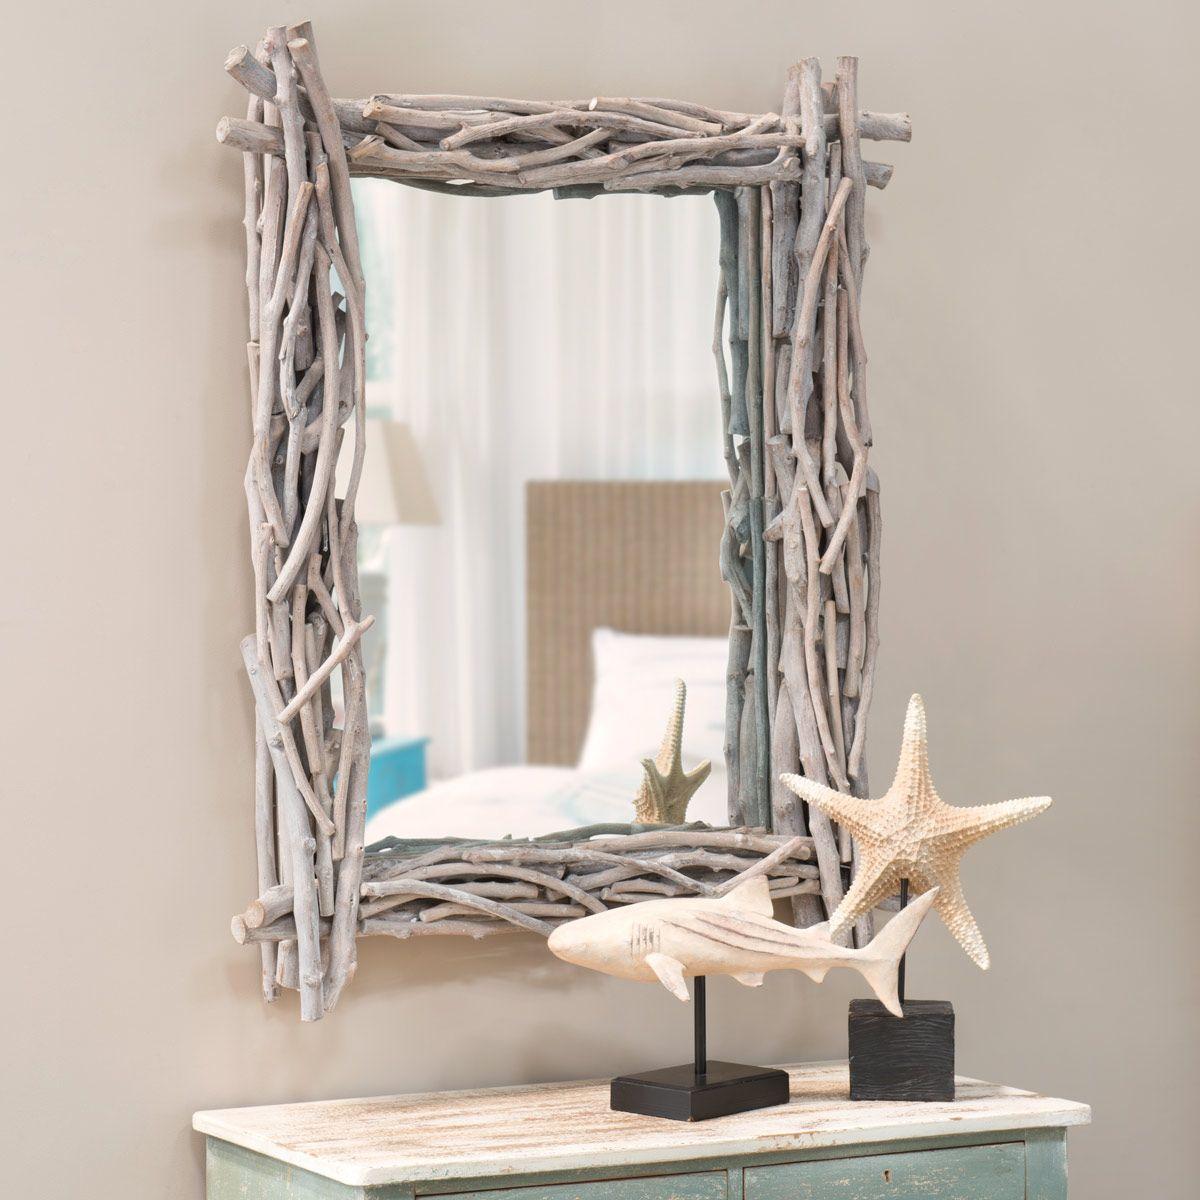 Miroir en bois flott h 113 cm miroir en bois flott - Miroir salle de bain maison du monde ...